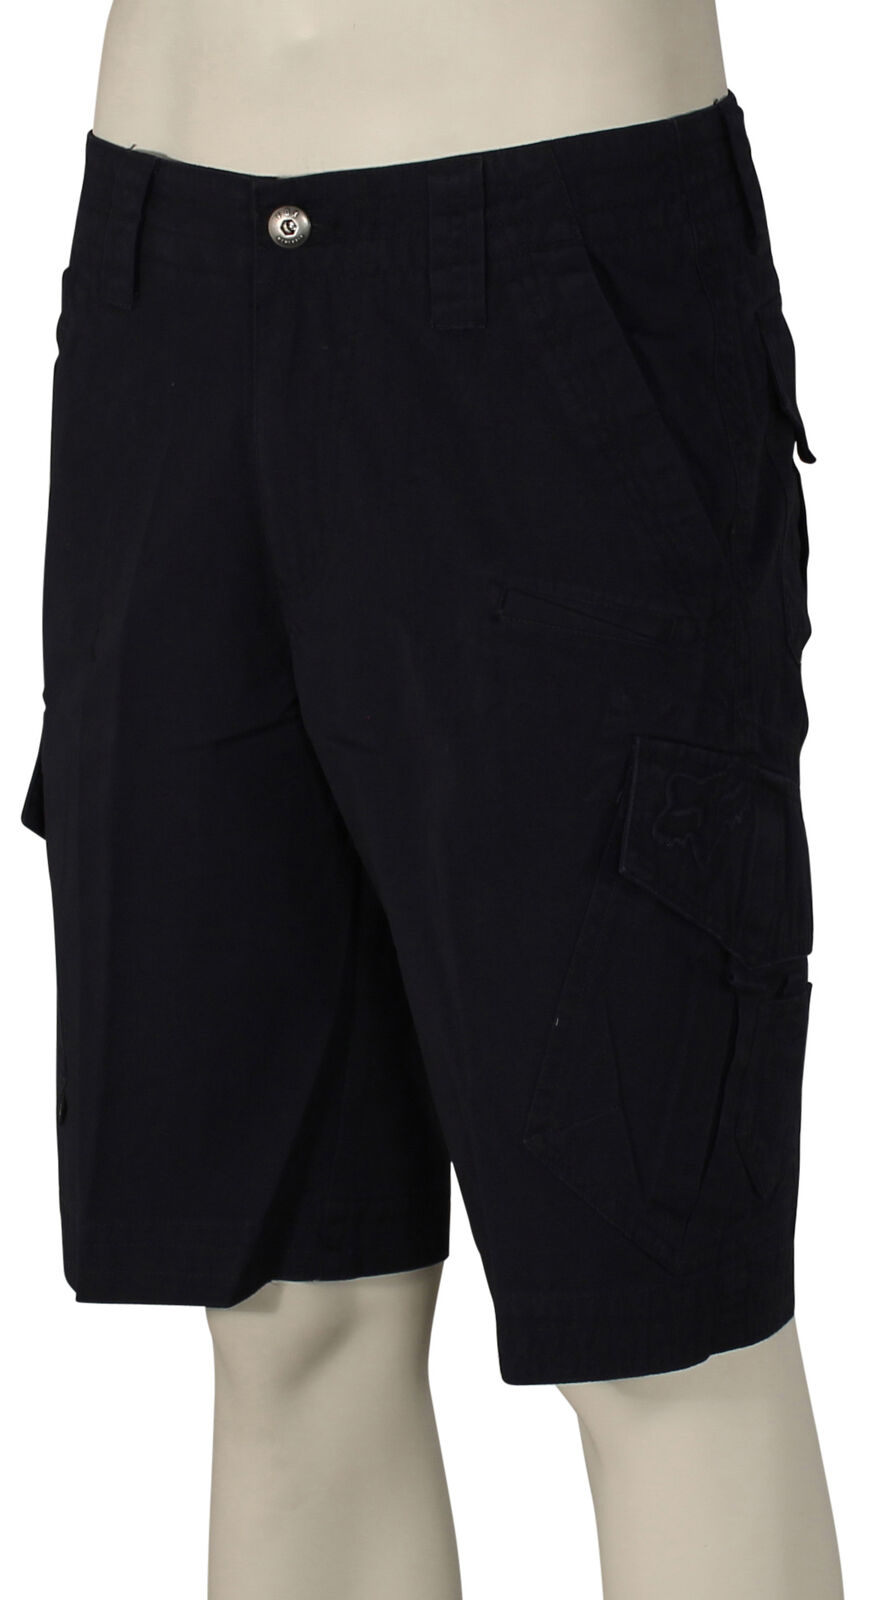 945bdd58a1bb Fox Cargo Shorts - - New Midnight Slambozo ndsqrn22798-Shorts - www ...